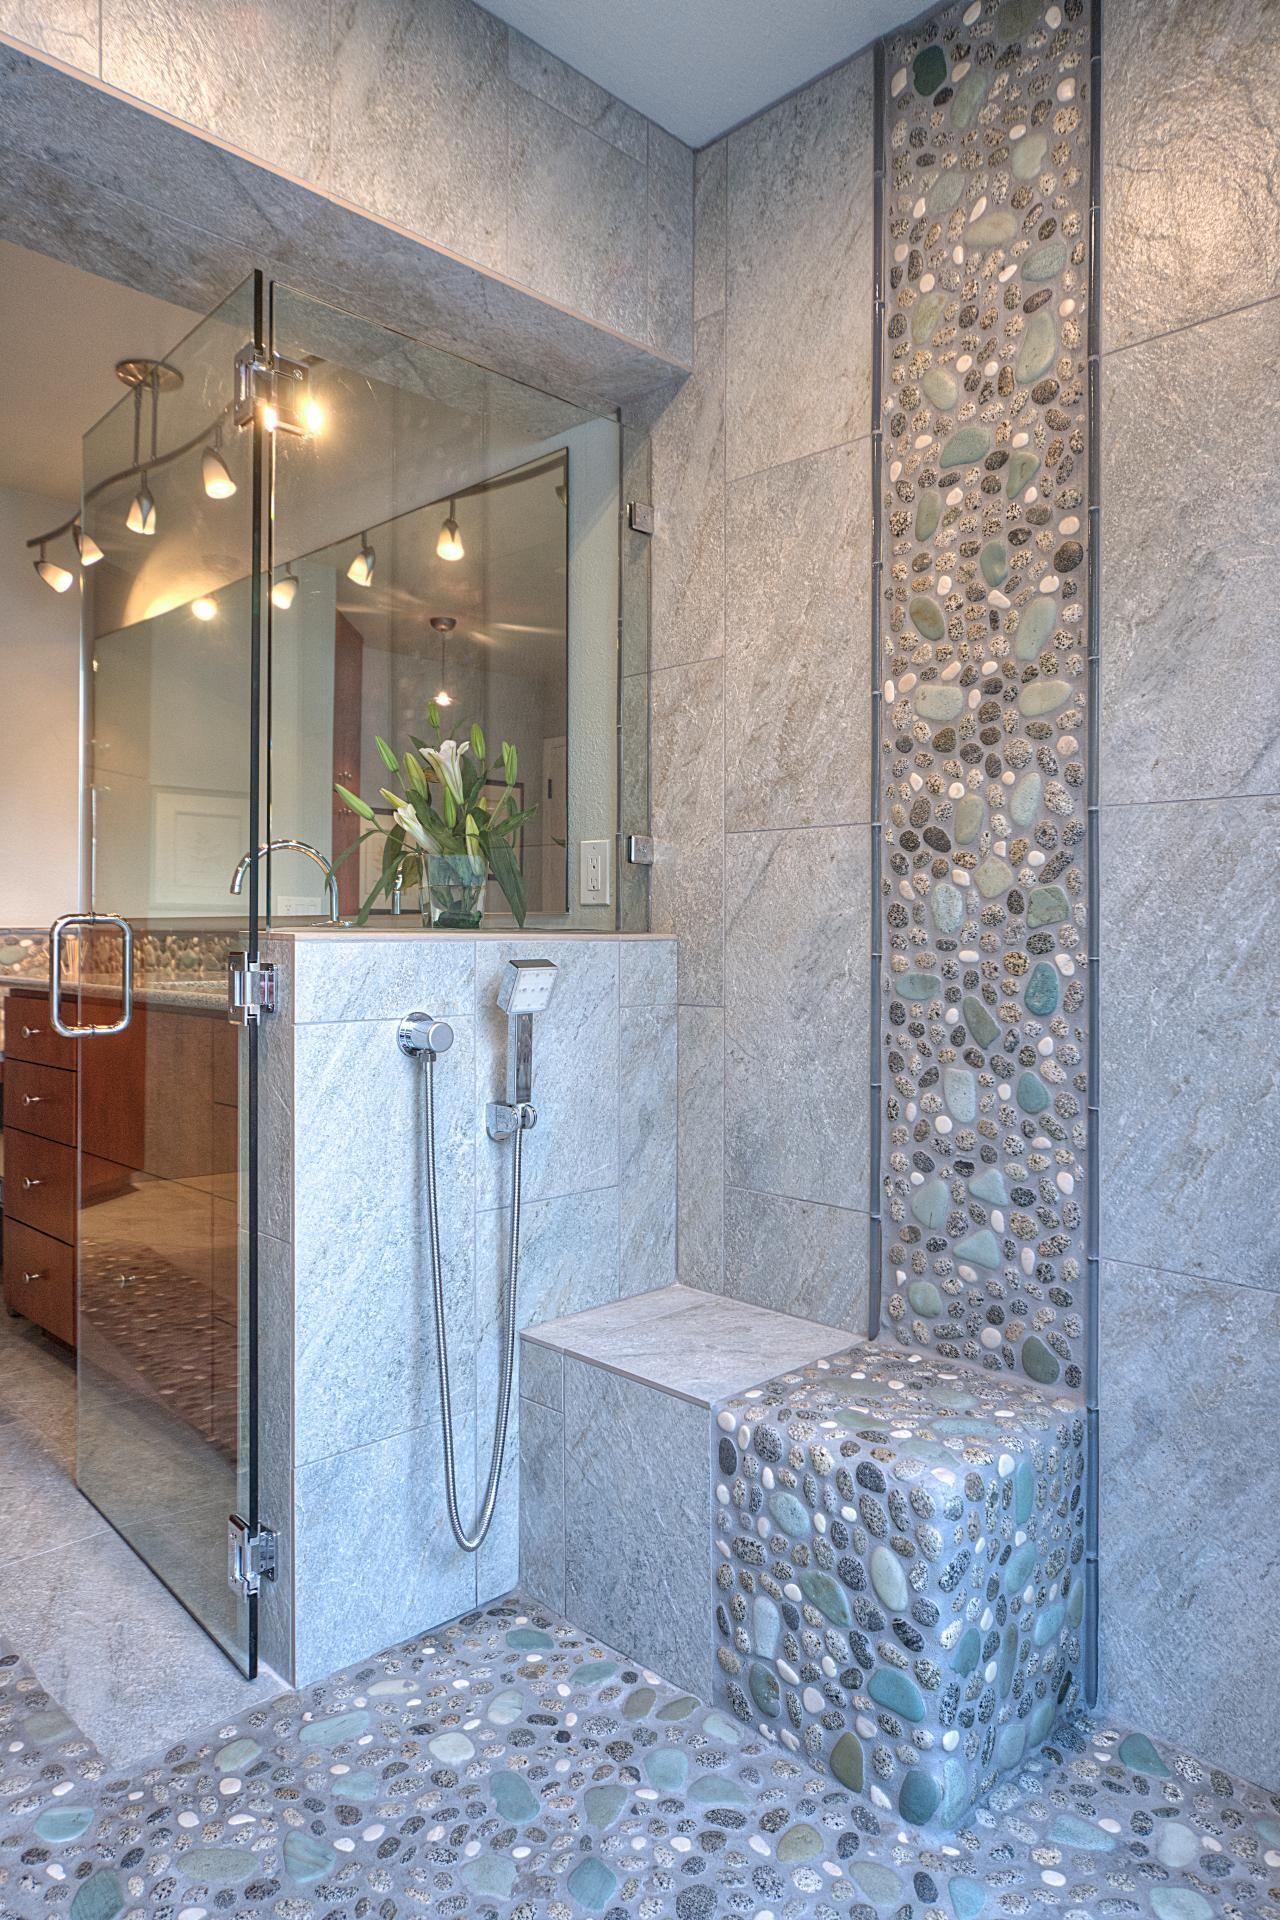 Best Tile For Bathroom Shower